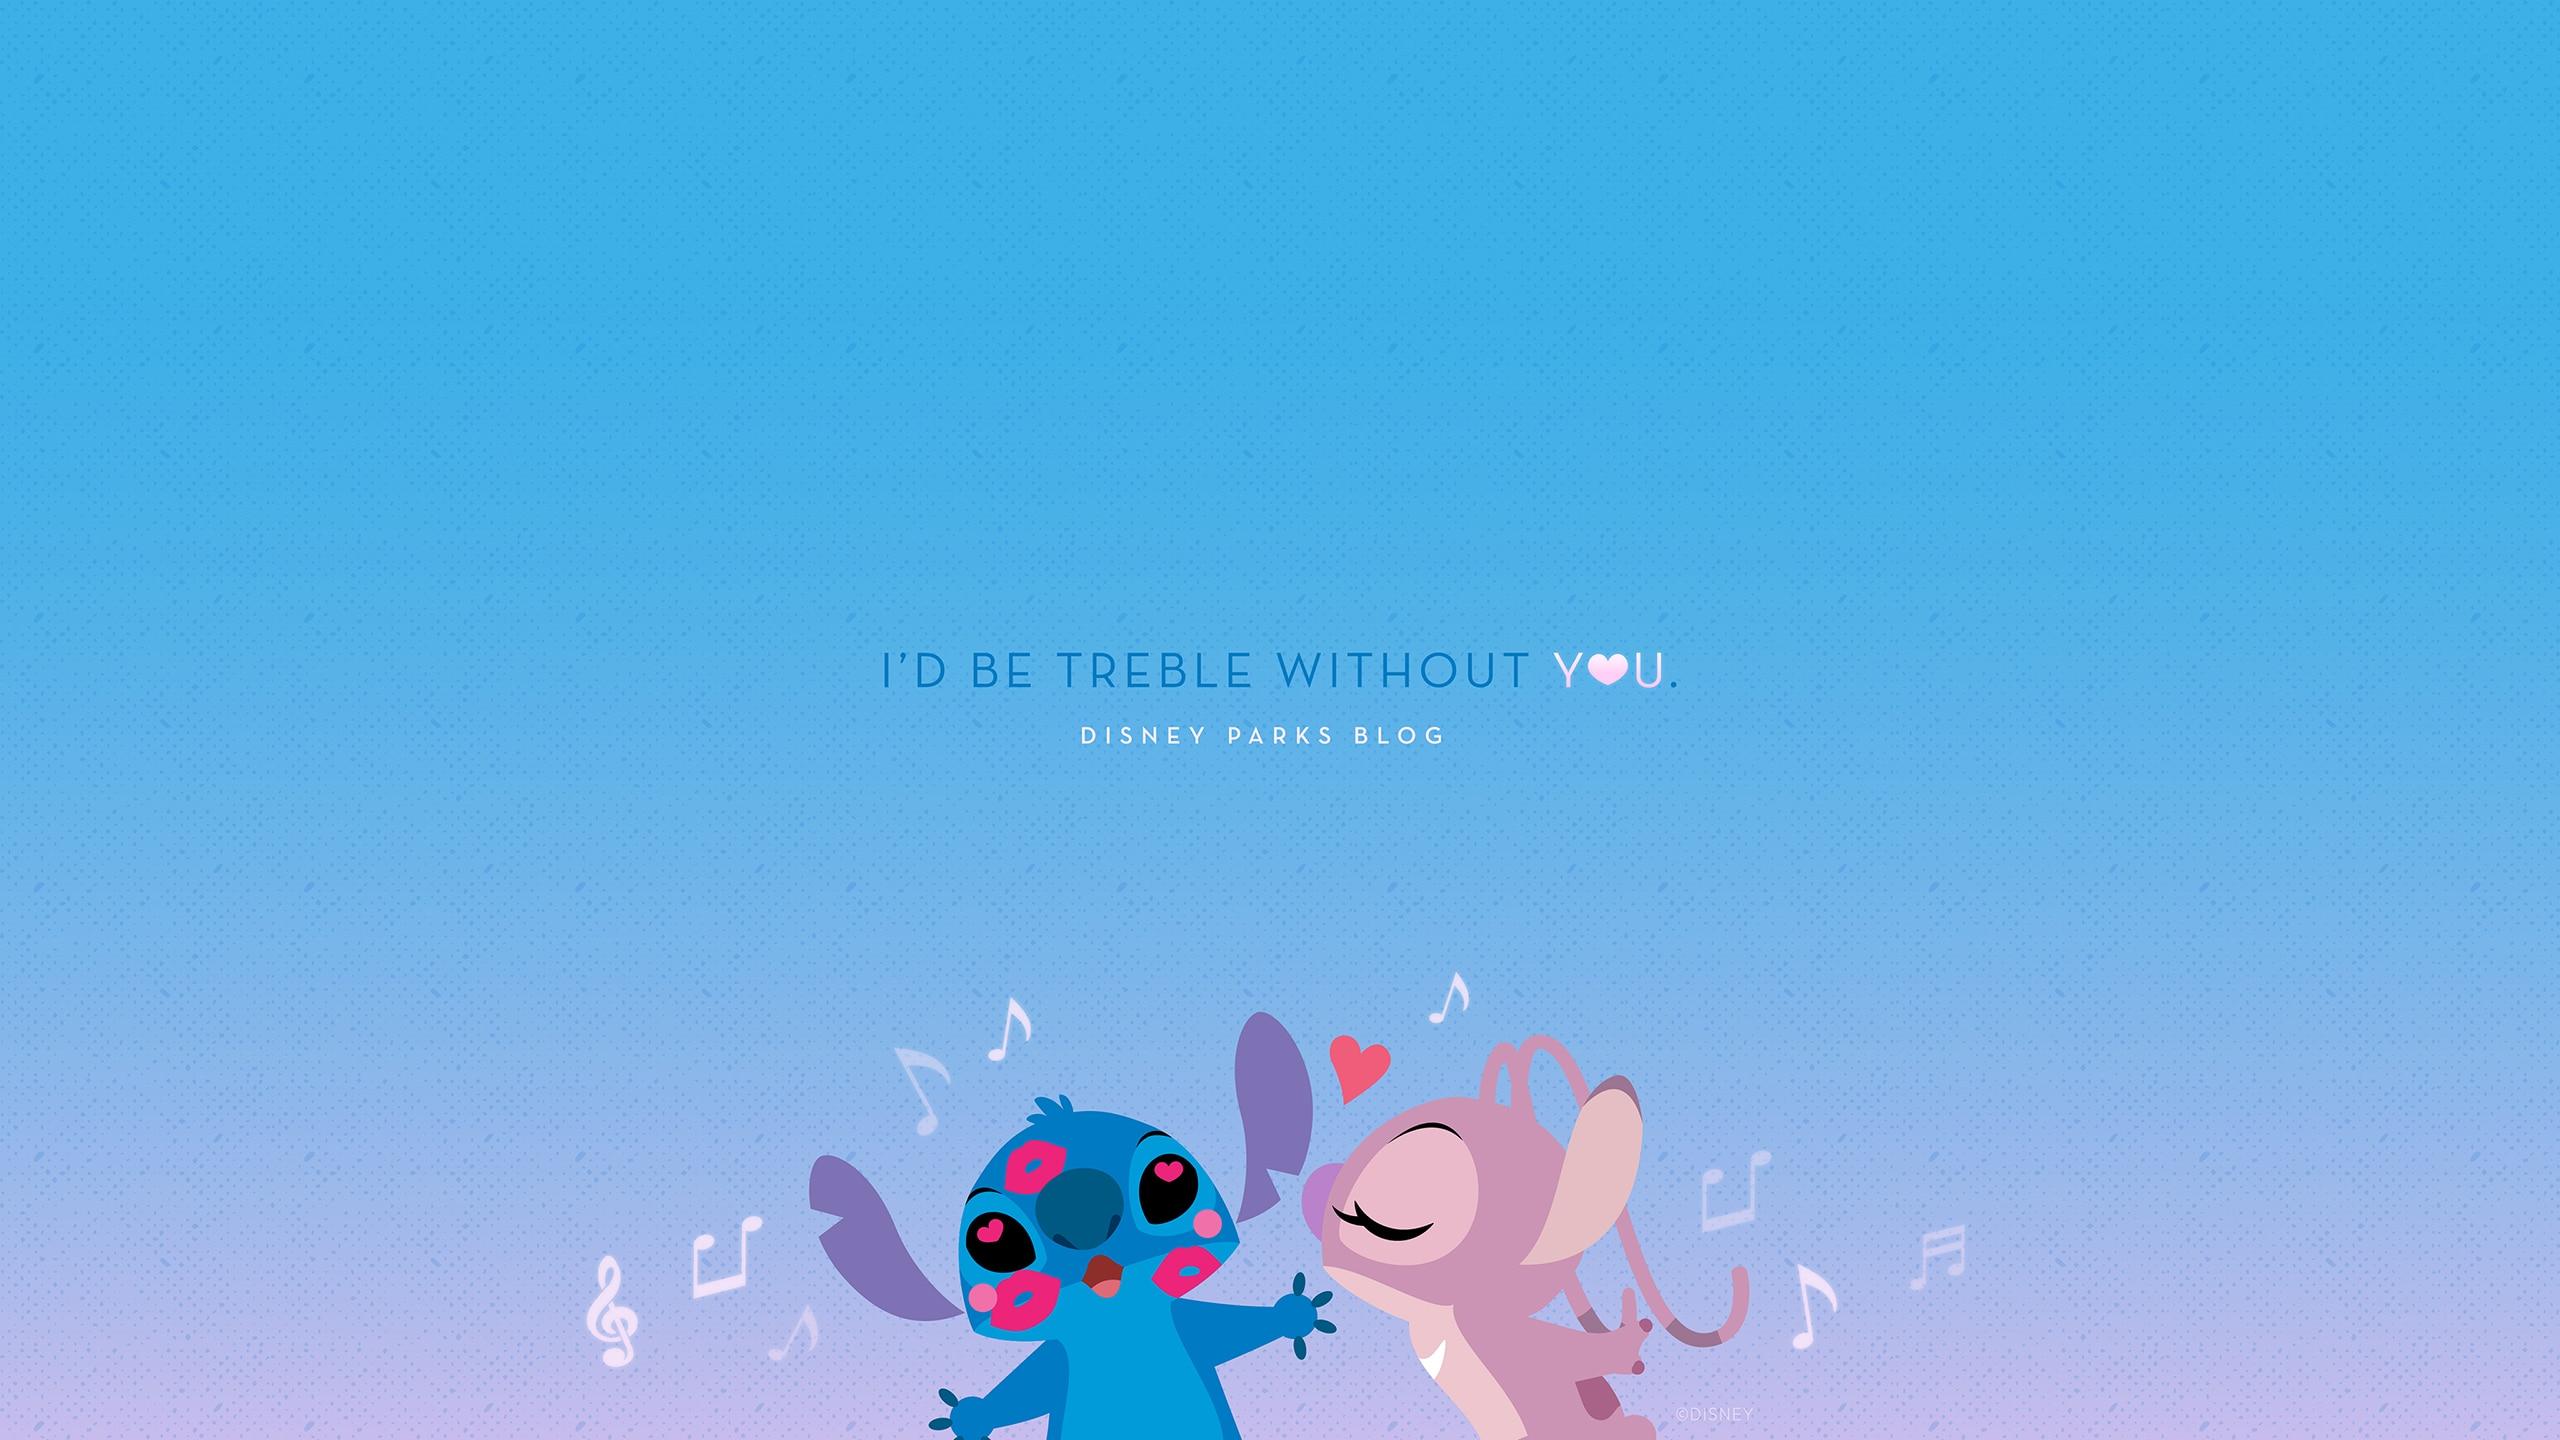 2019 Stitch Valentine S Day Wallpaper Desktop Ipad Disney Parks Blog